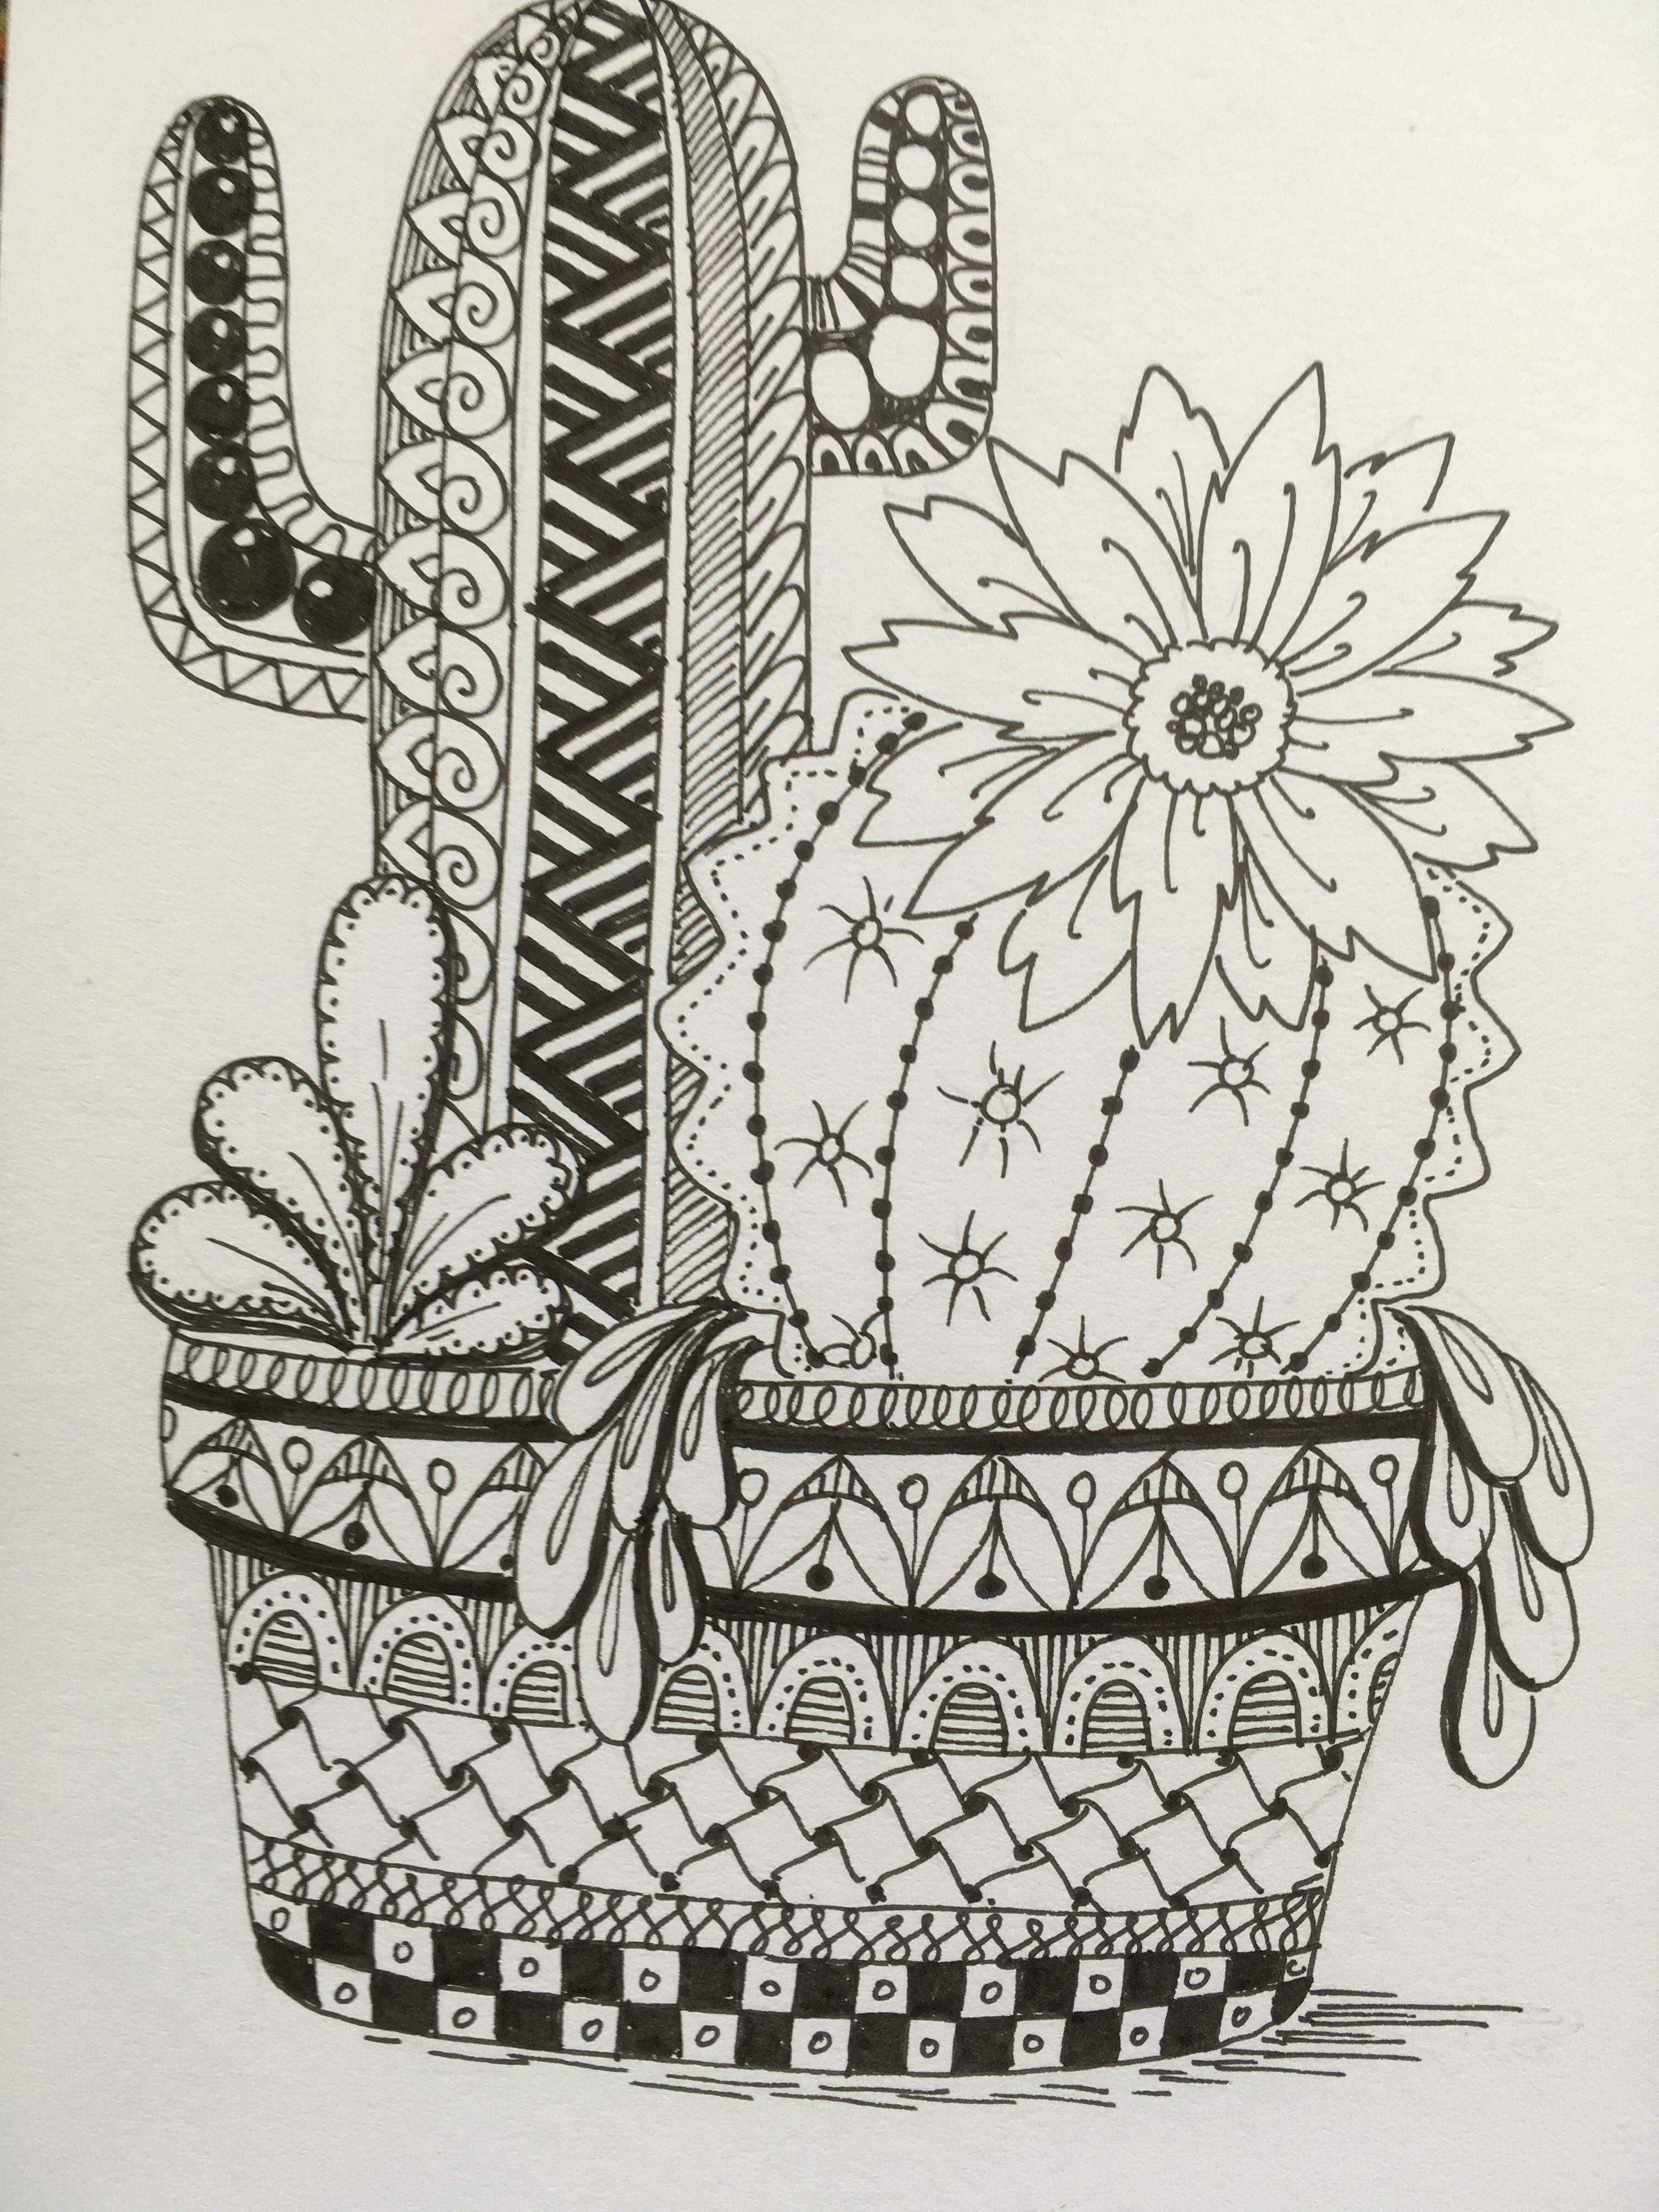 Cactus Cactus Art Zentangle Drawings Whimsical Art